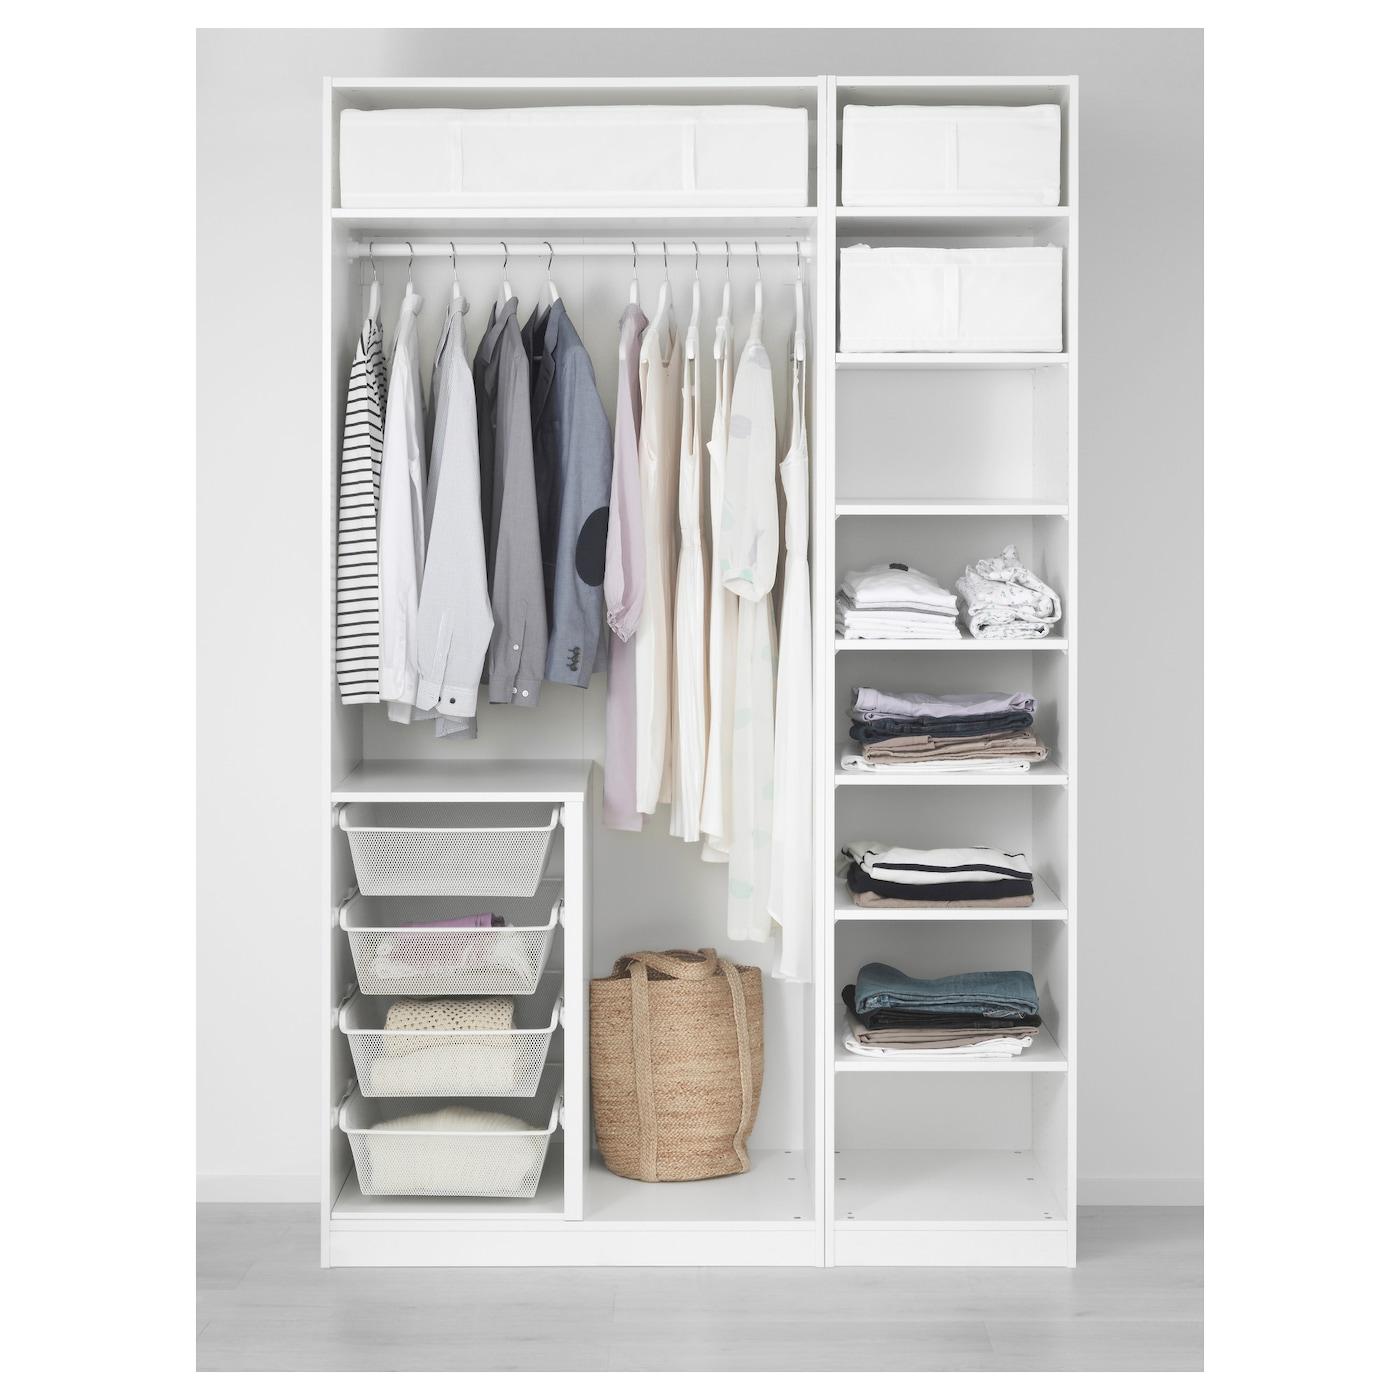 pax wardrobe white 150x58x236 cm ikea. Black Bedroom Furniture Sets. Home Design Ideas